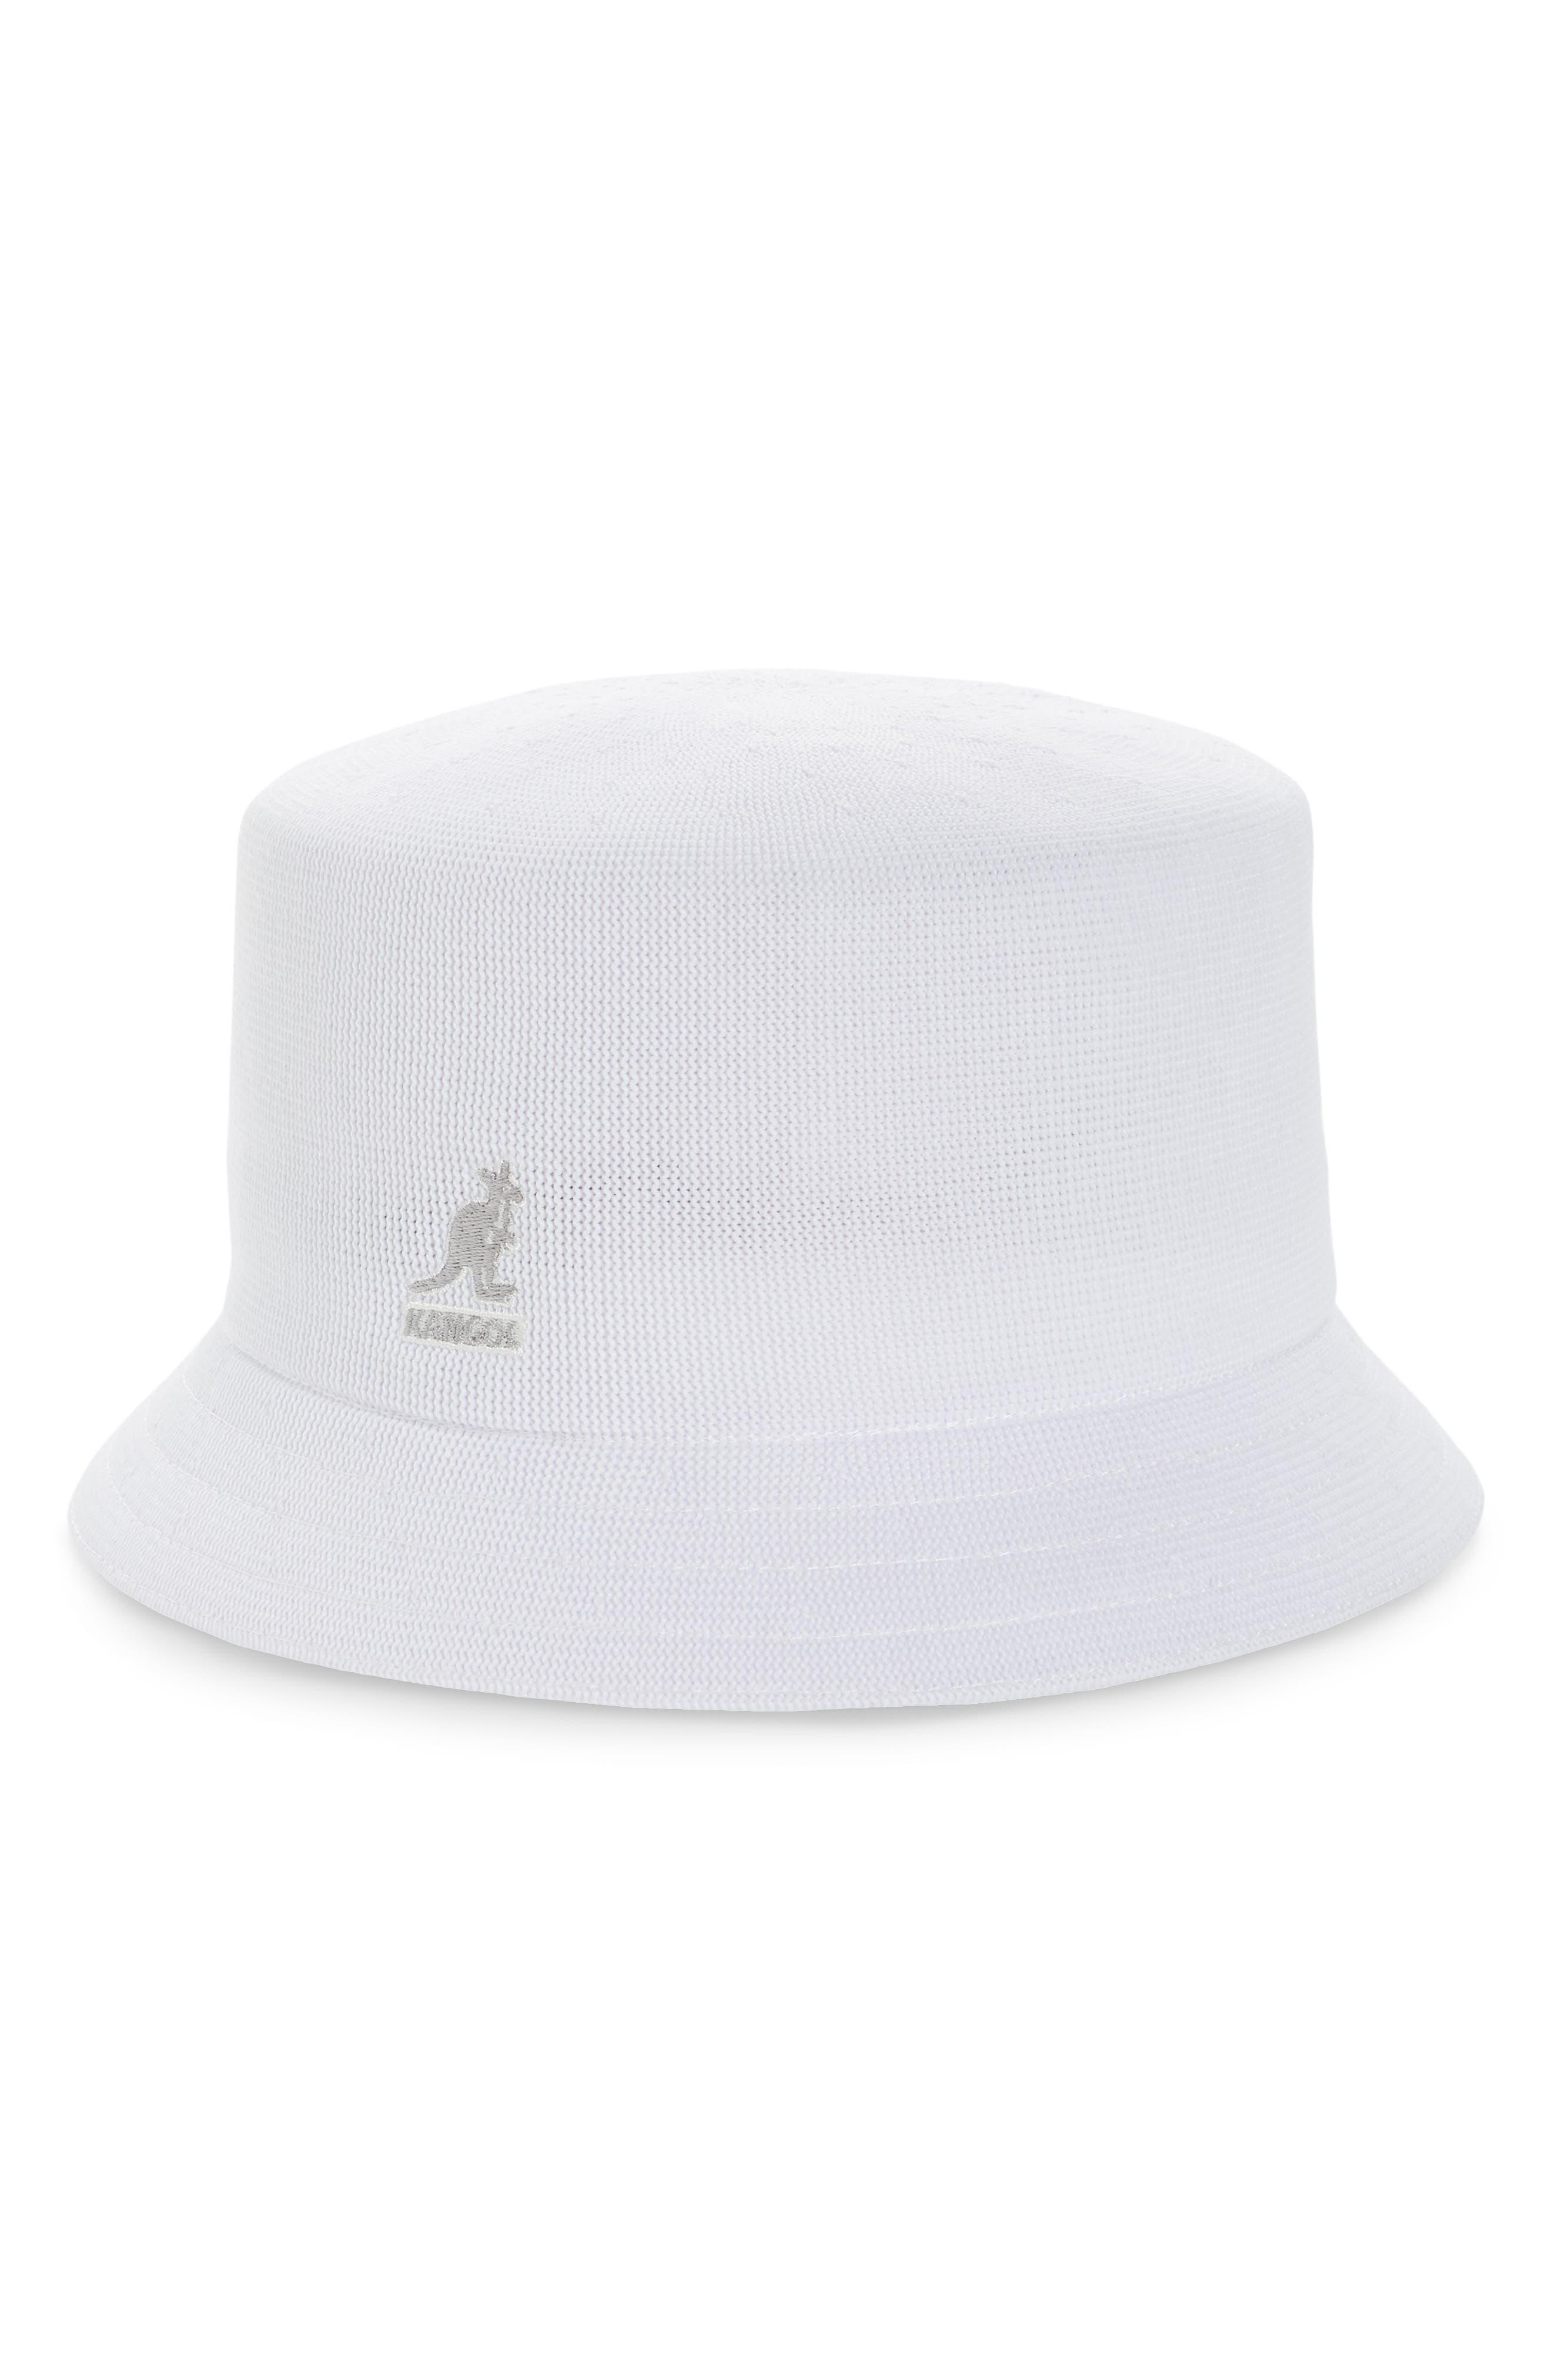 5ffbf235df8 Kangol Hats for Women